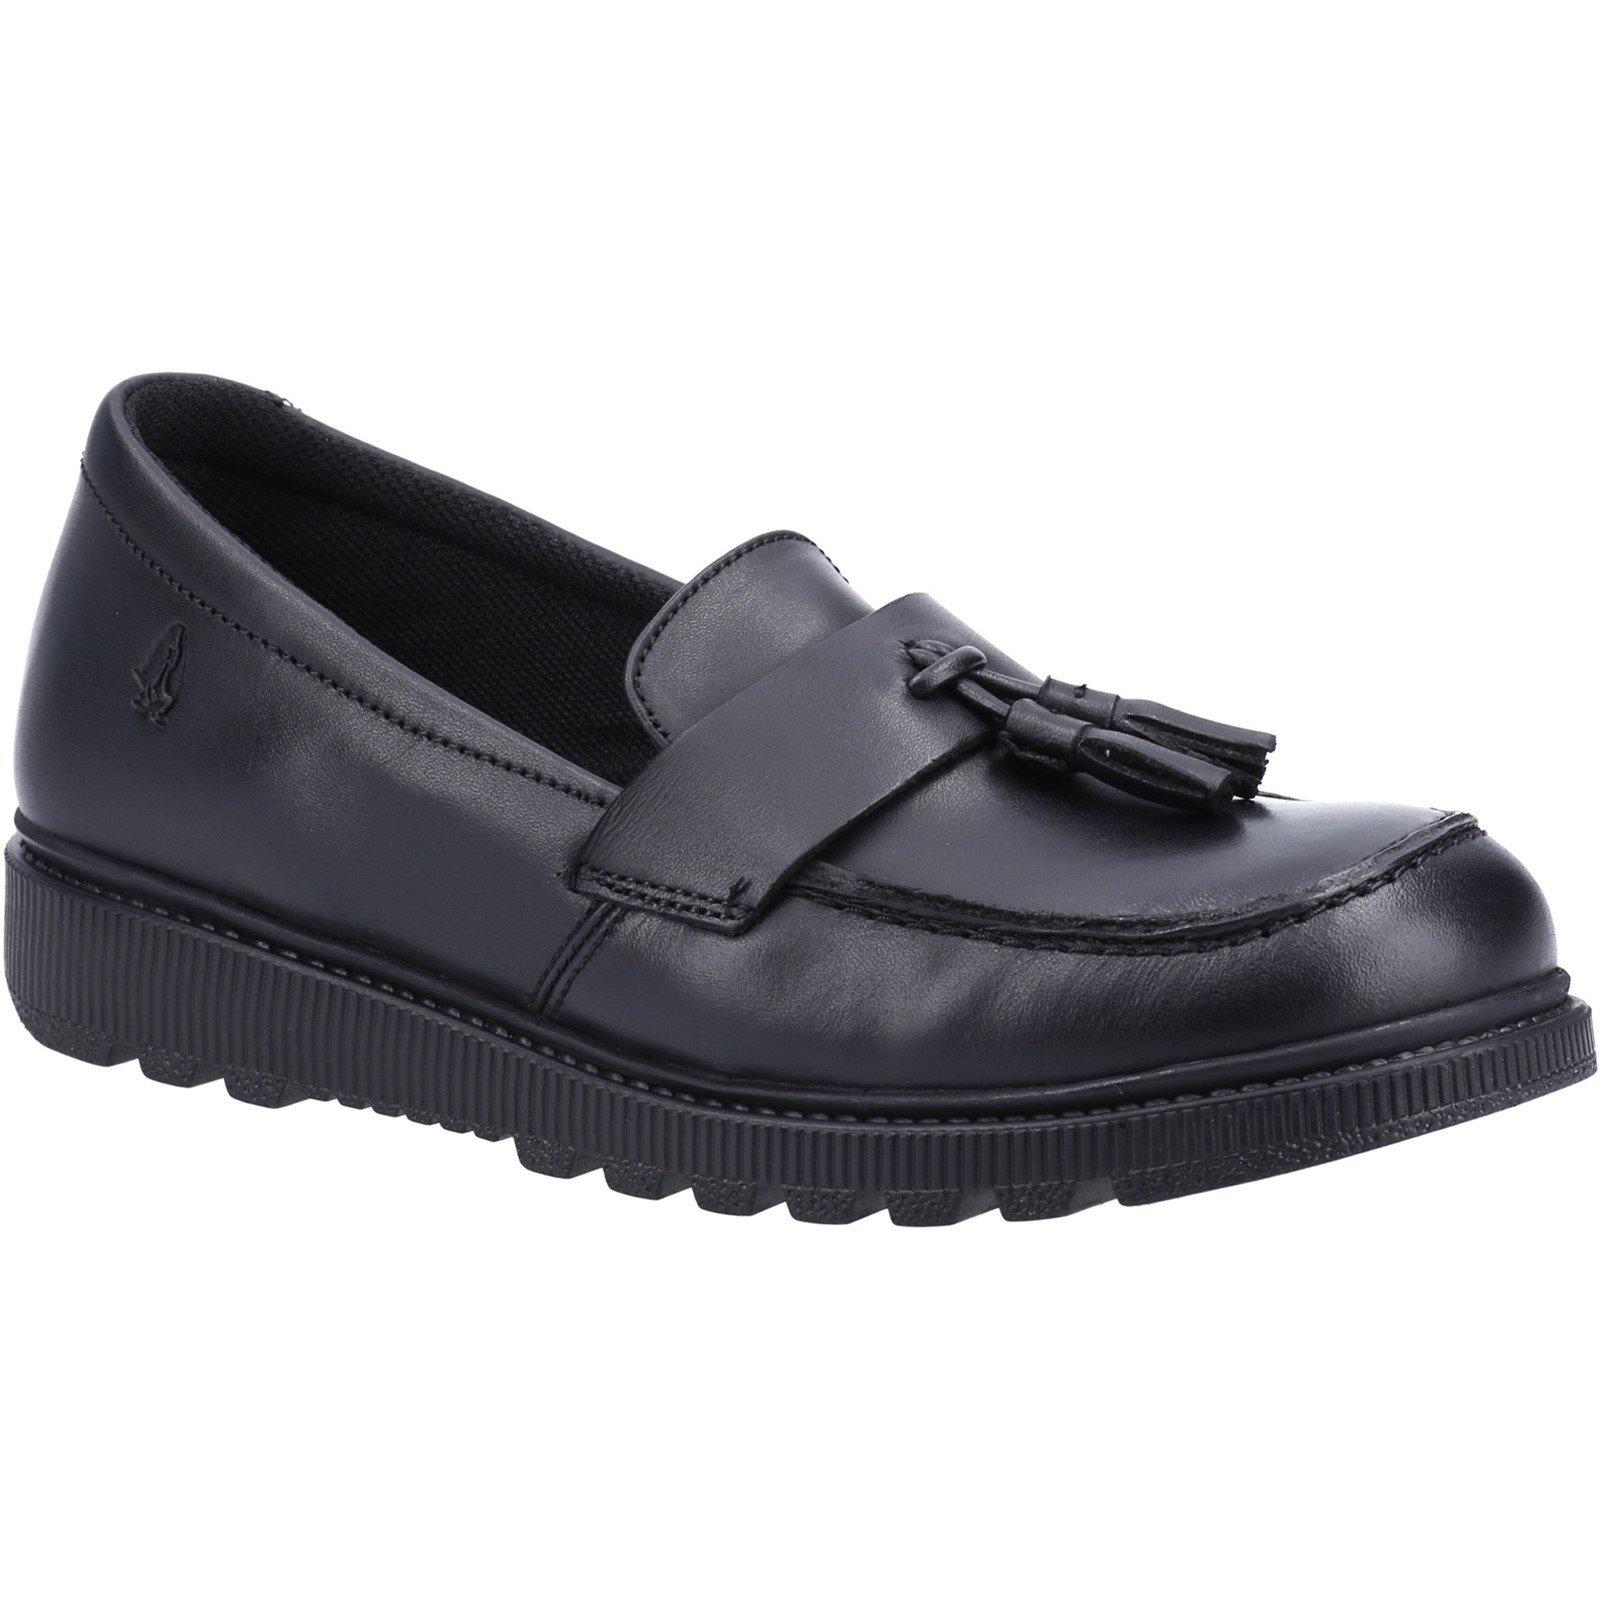 Hush Puppies Kid's Faye Senior School Shoe Patent Black 30844 - Patent Black 6